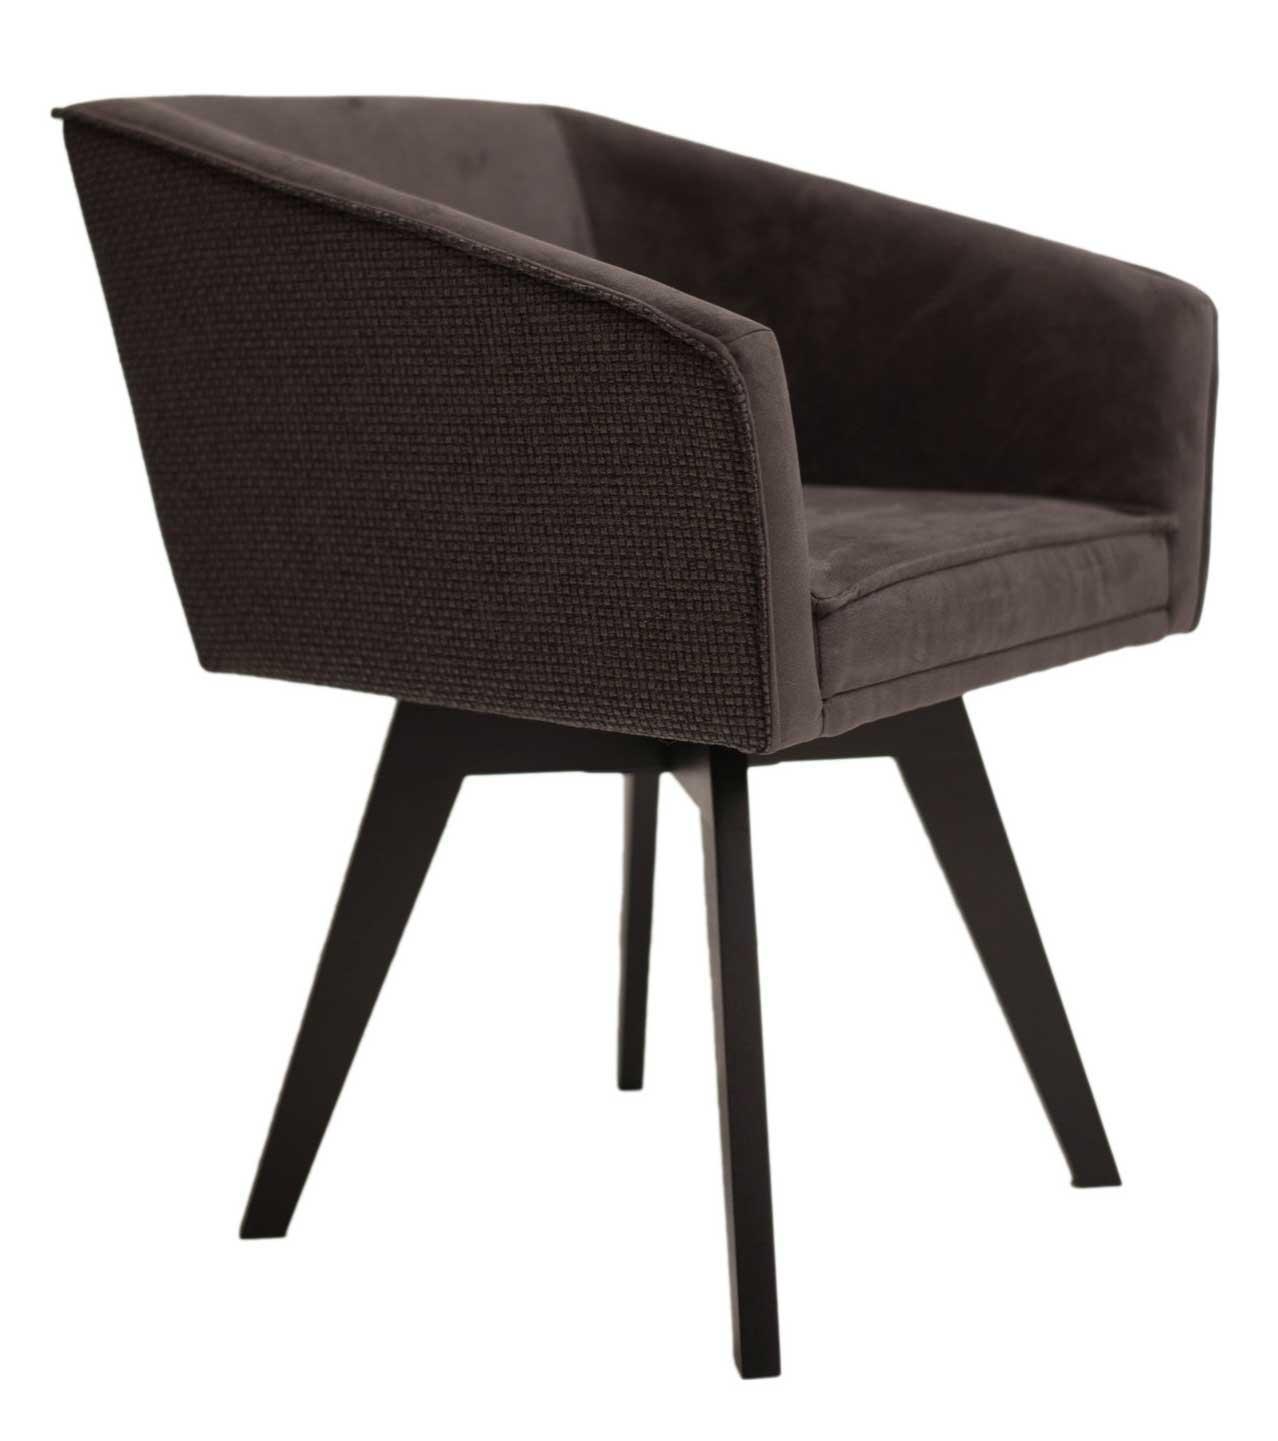 Standard Furniture Toulouse Schalenstuhl mit Drehgestell modern